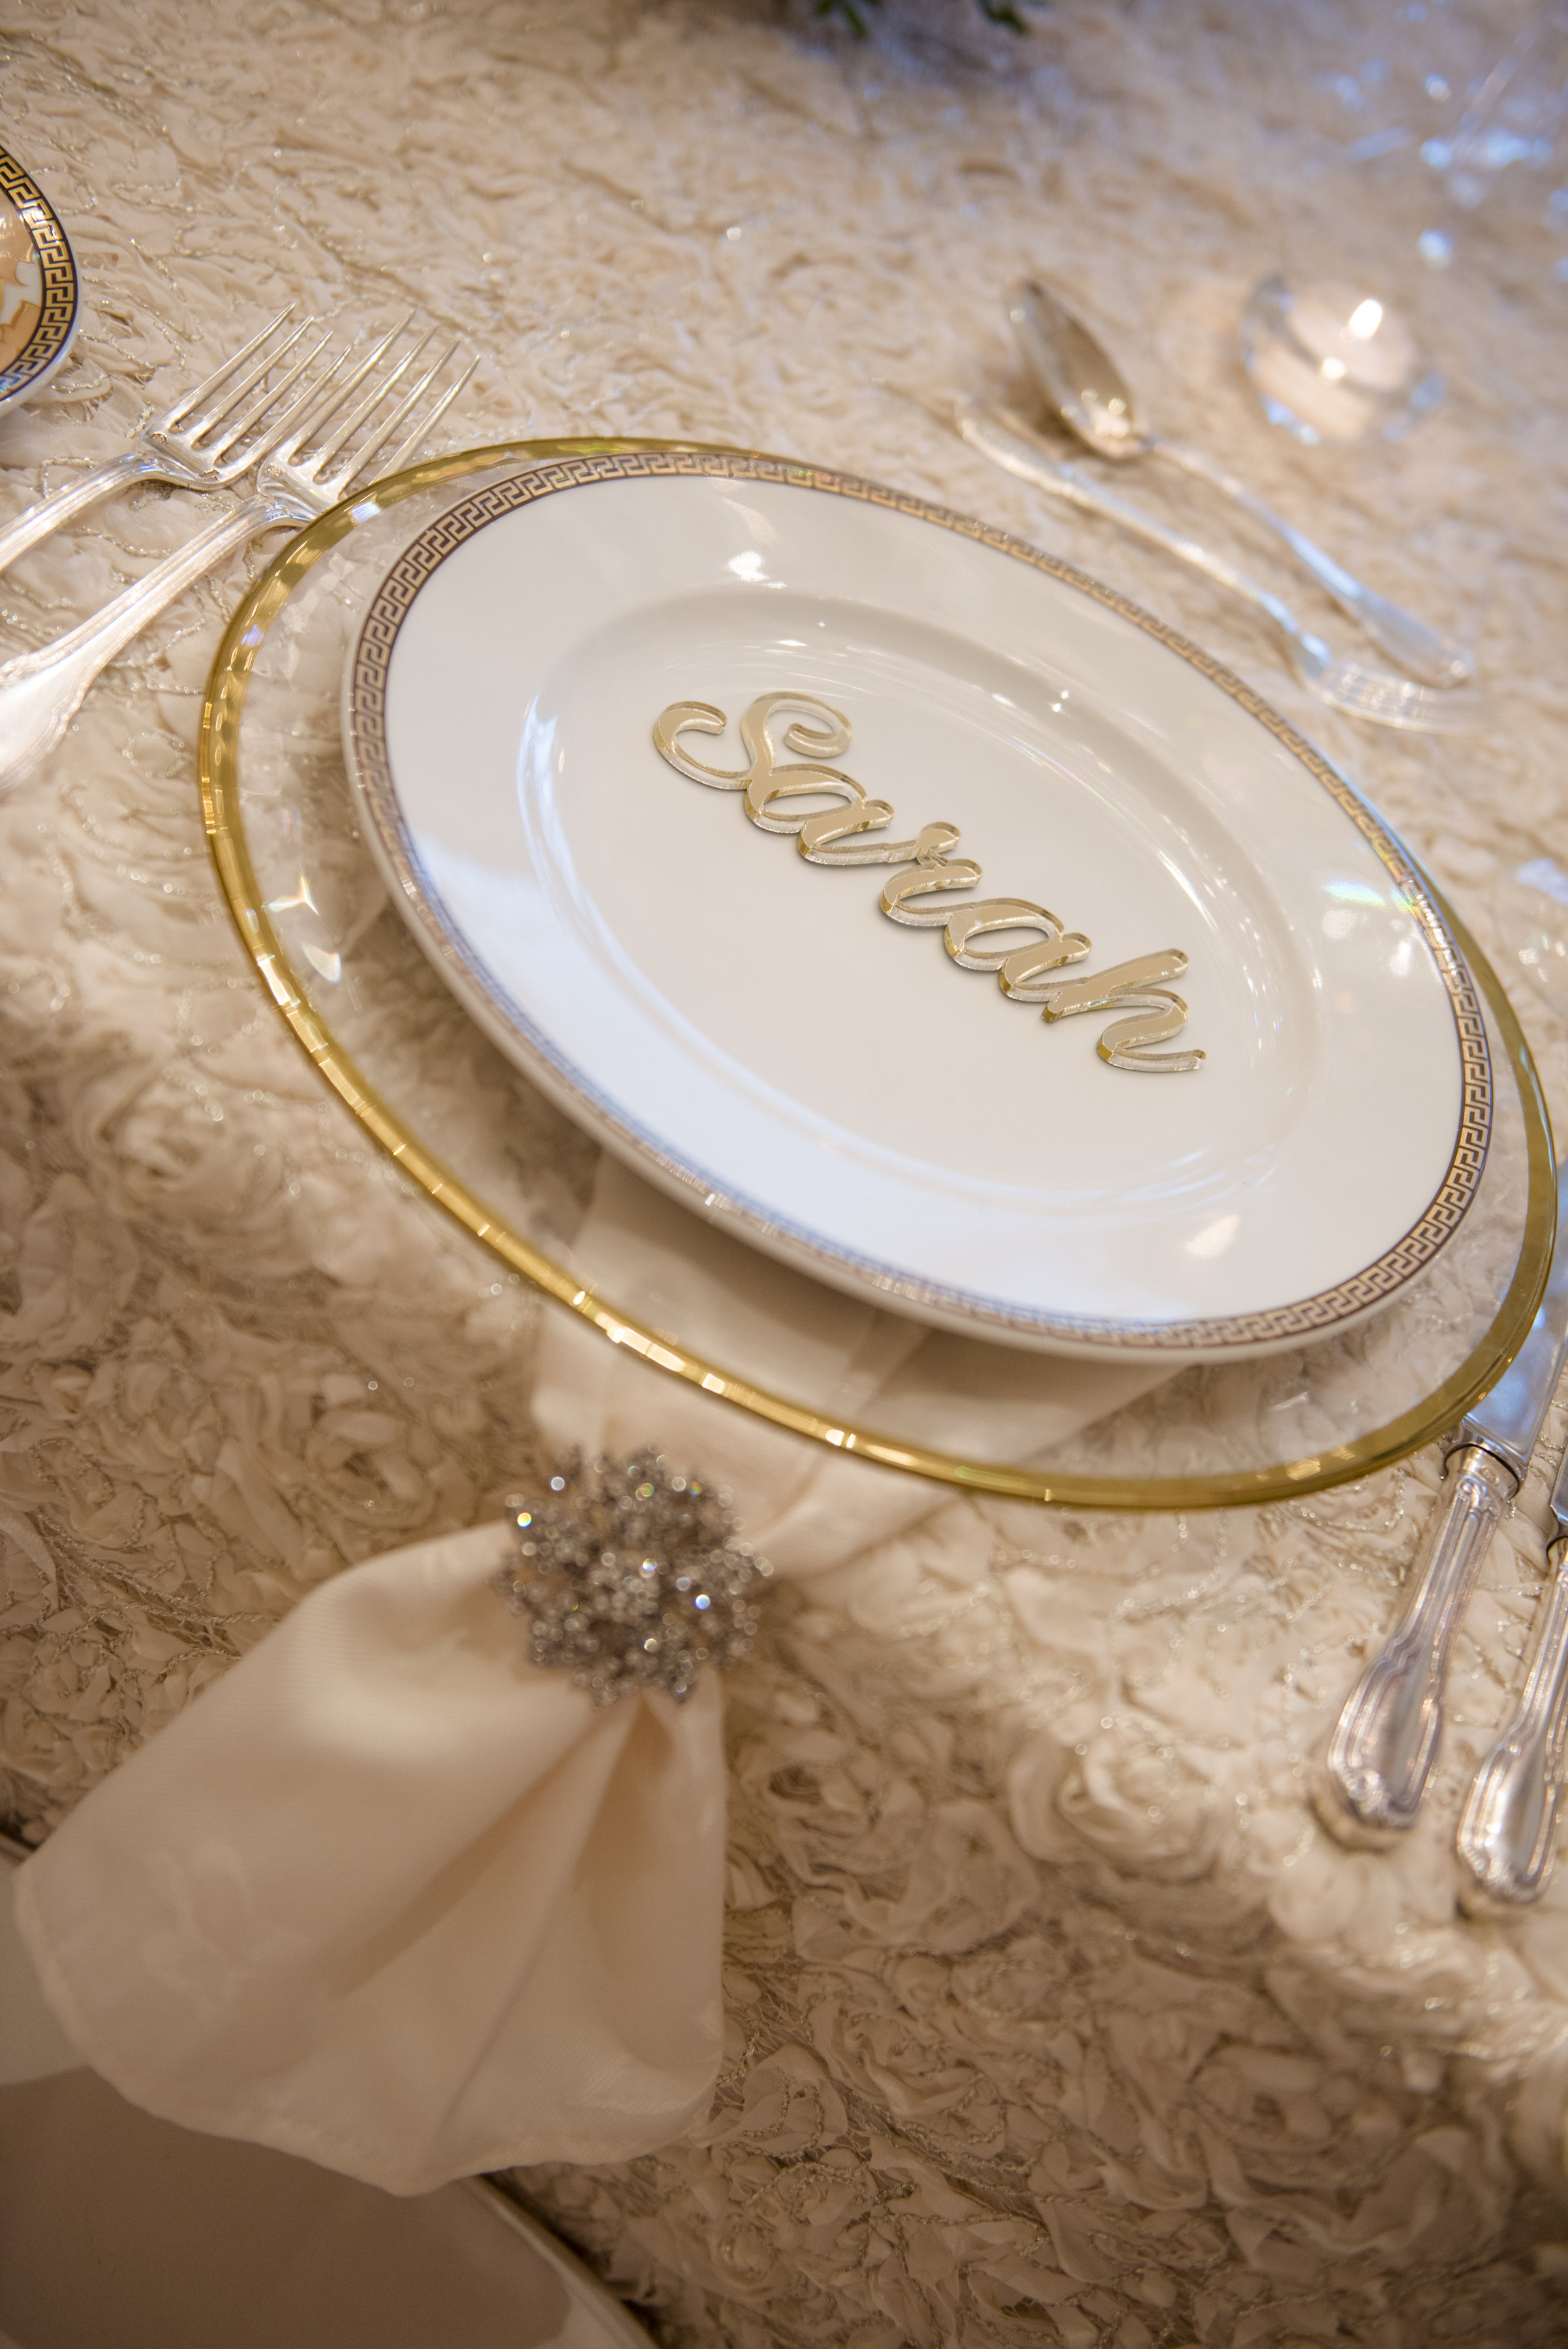 Hire_Ivory_rose_luxury_linen_sydney_wedding_decor_event_Versace_Decor_gold_charger_plate_napkin_ring.jpg